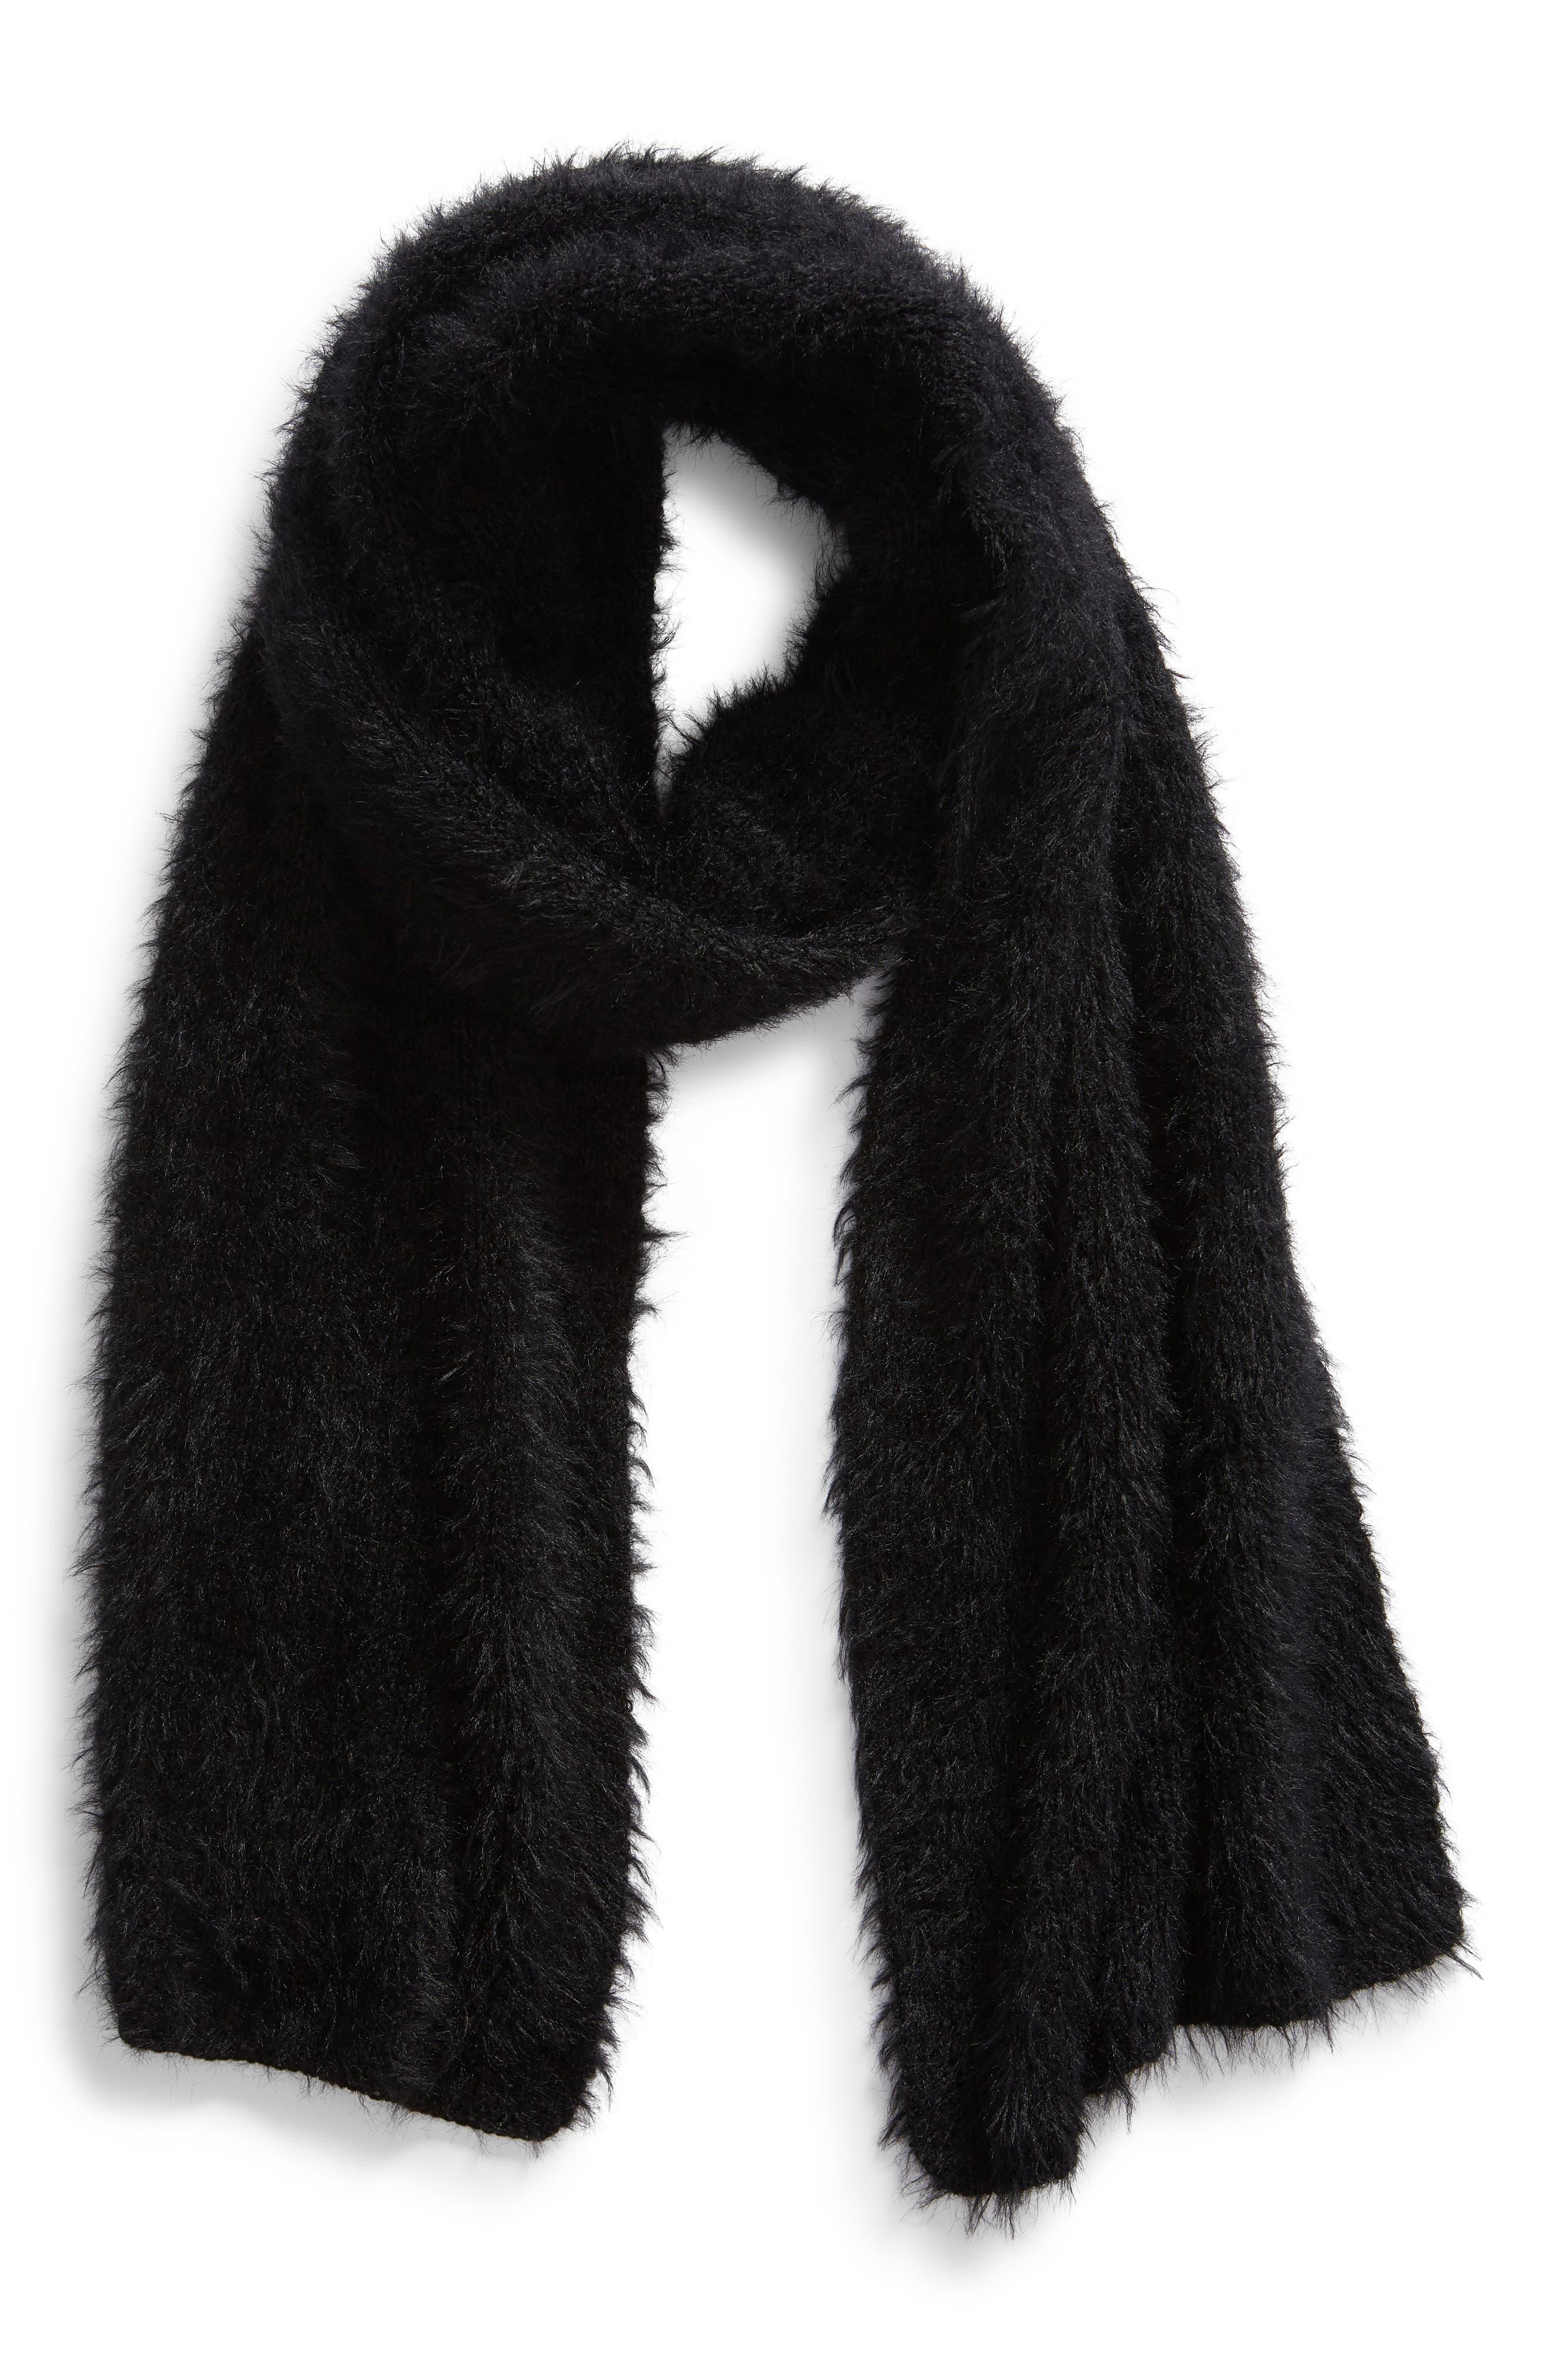 Eyleash Knit Muffler,                             Alternate thumbnail 2, color,                             BLACK